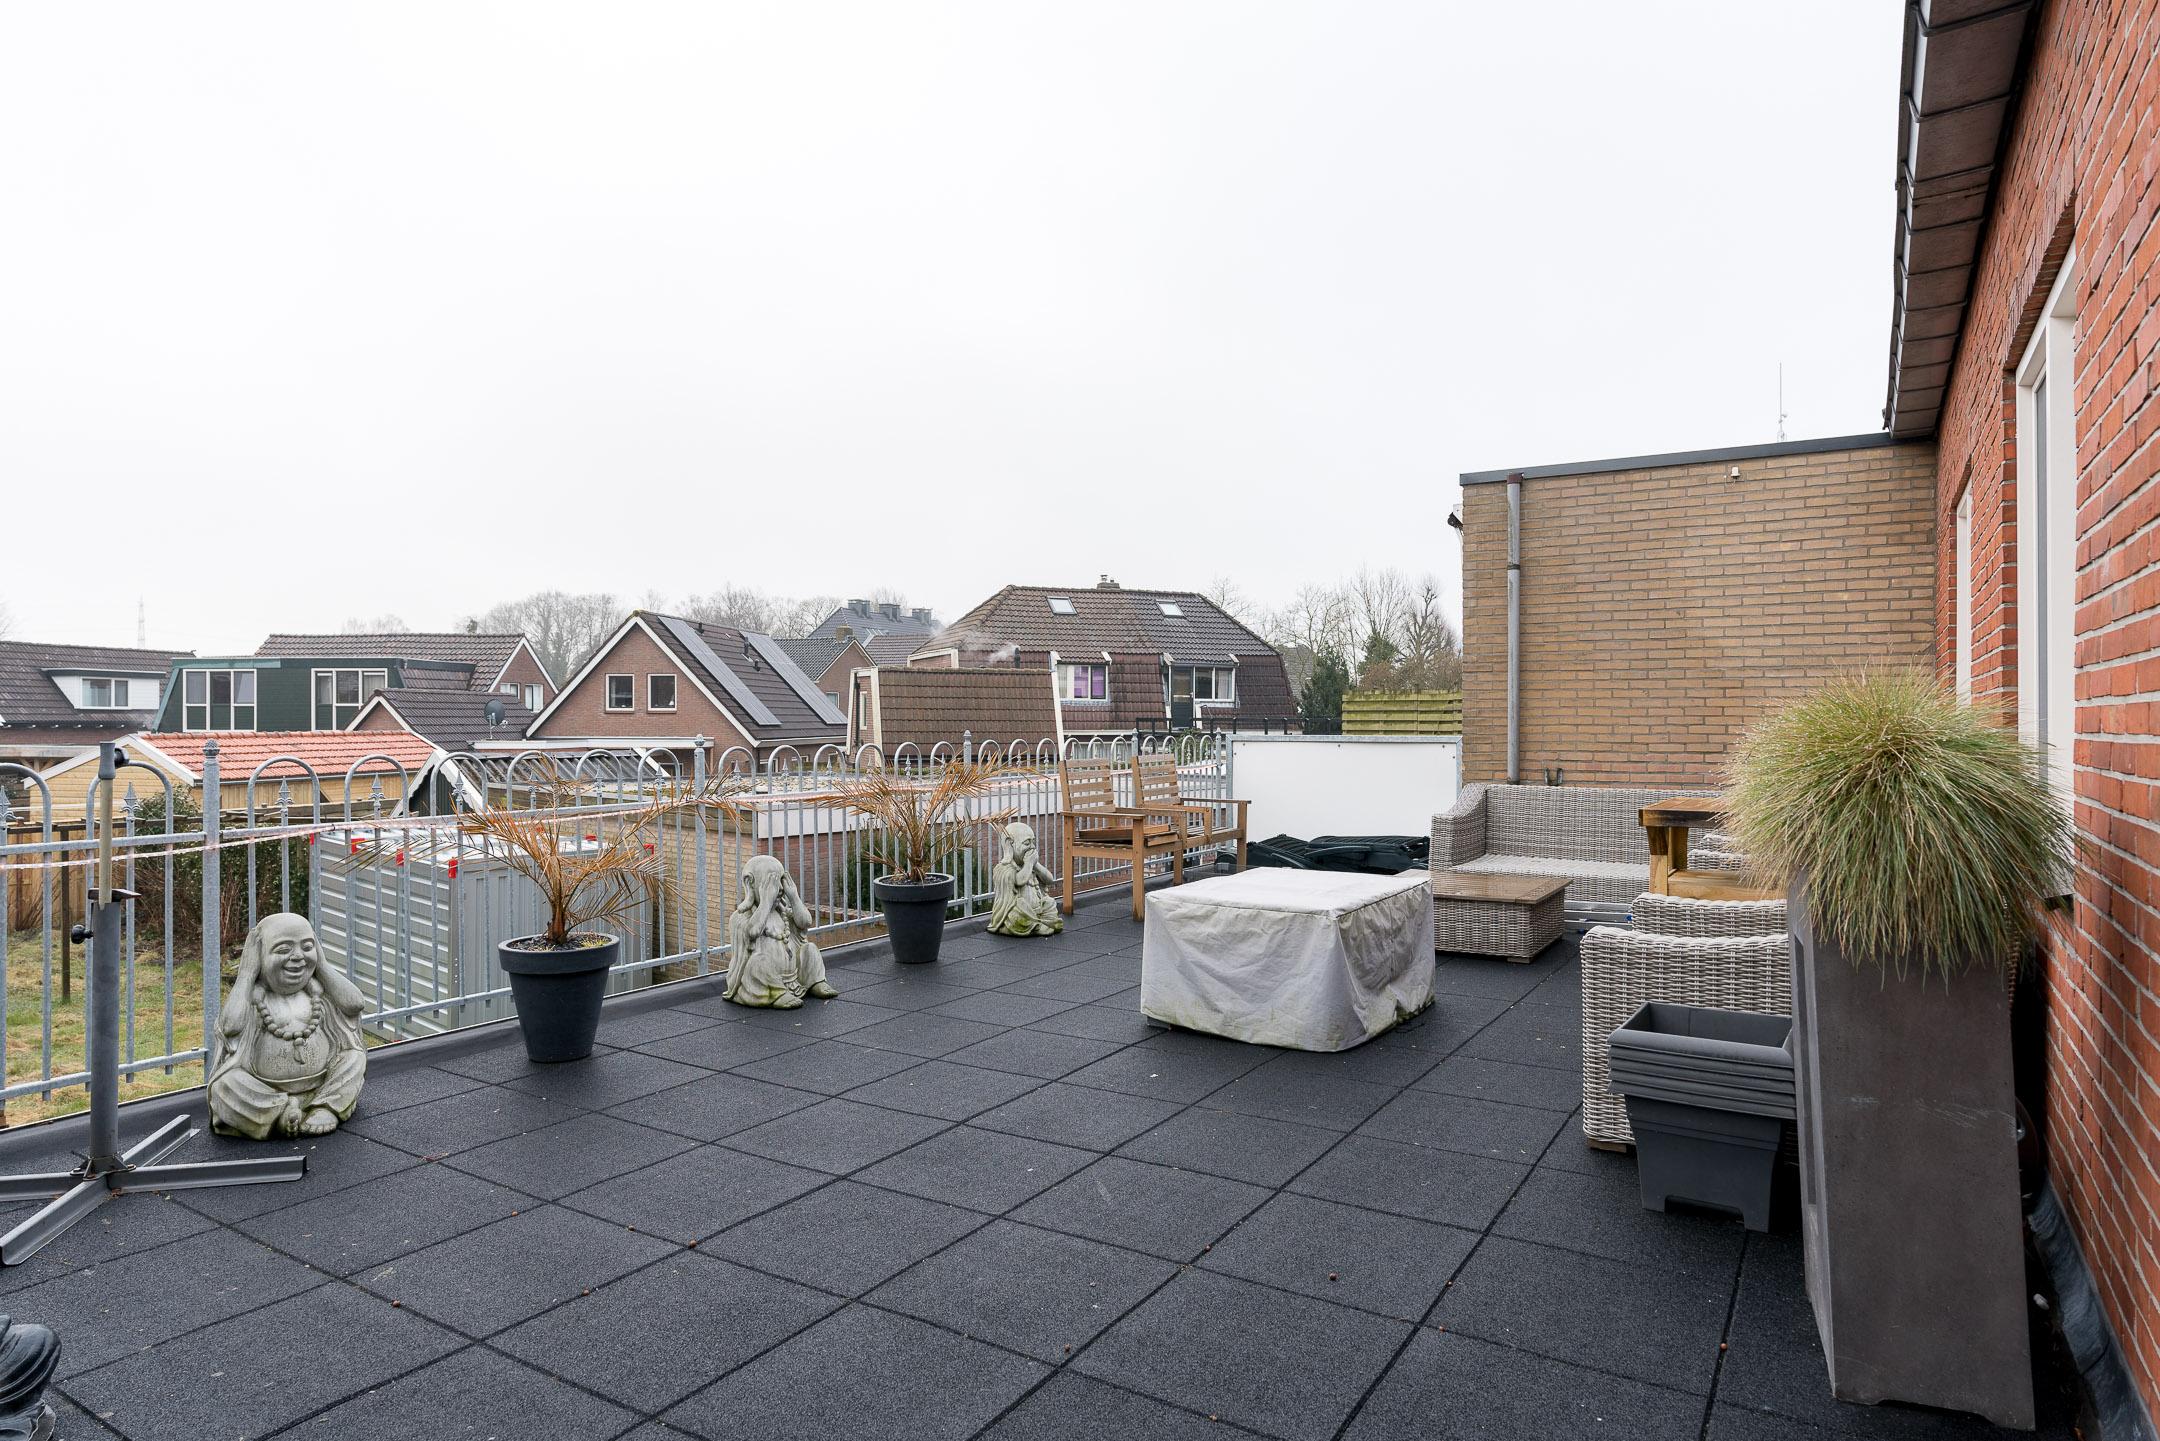 Hekstraat 34 a,Beilen,Drenthe,4 BadkamerBadkamer,Woningen,Hekstraat,2,1066